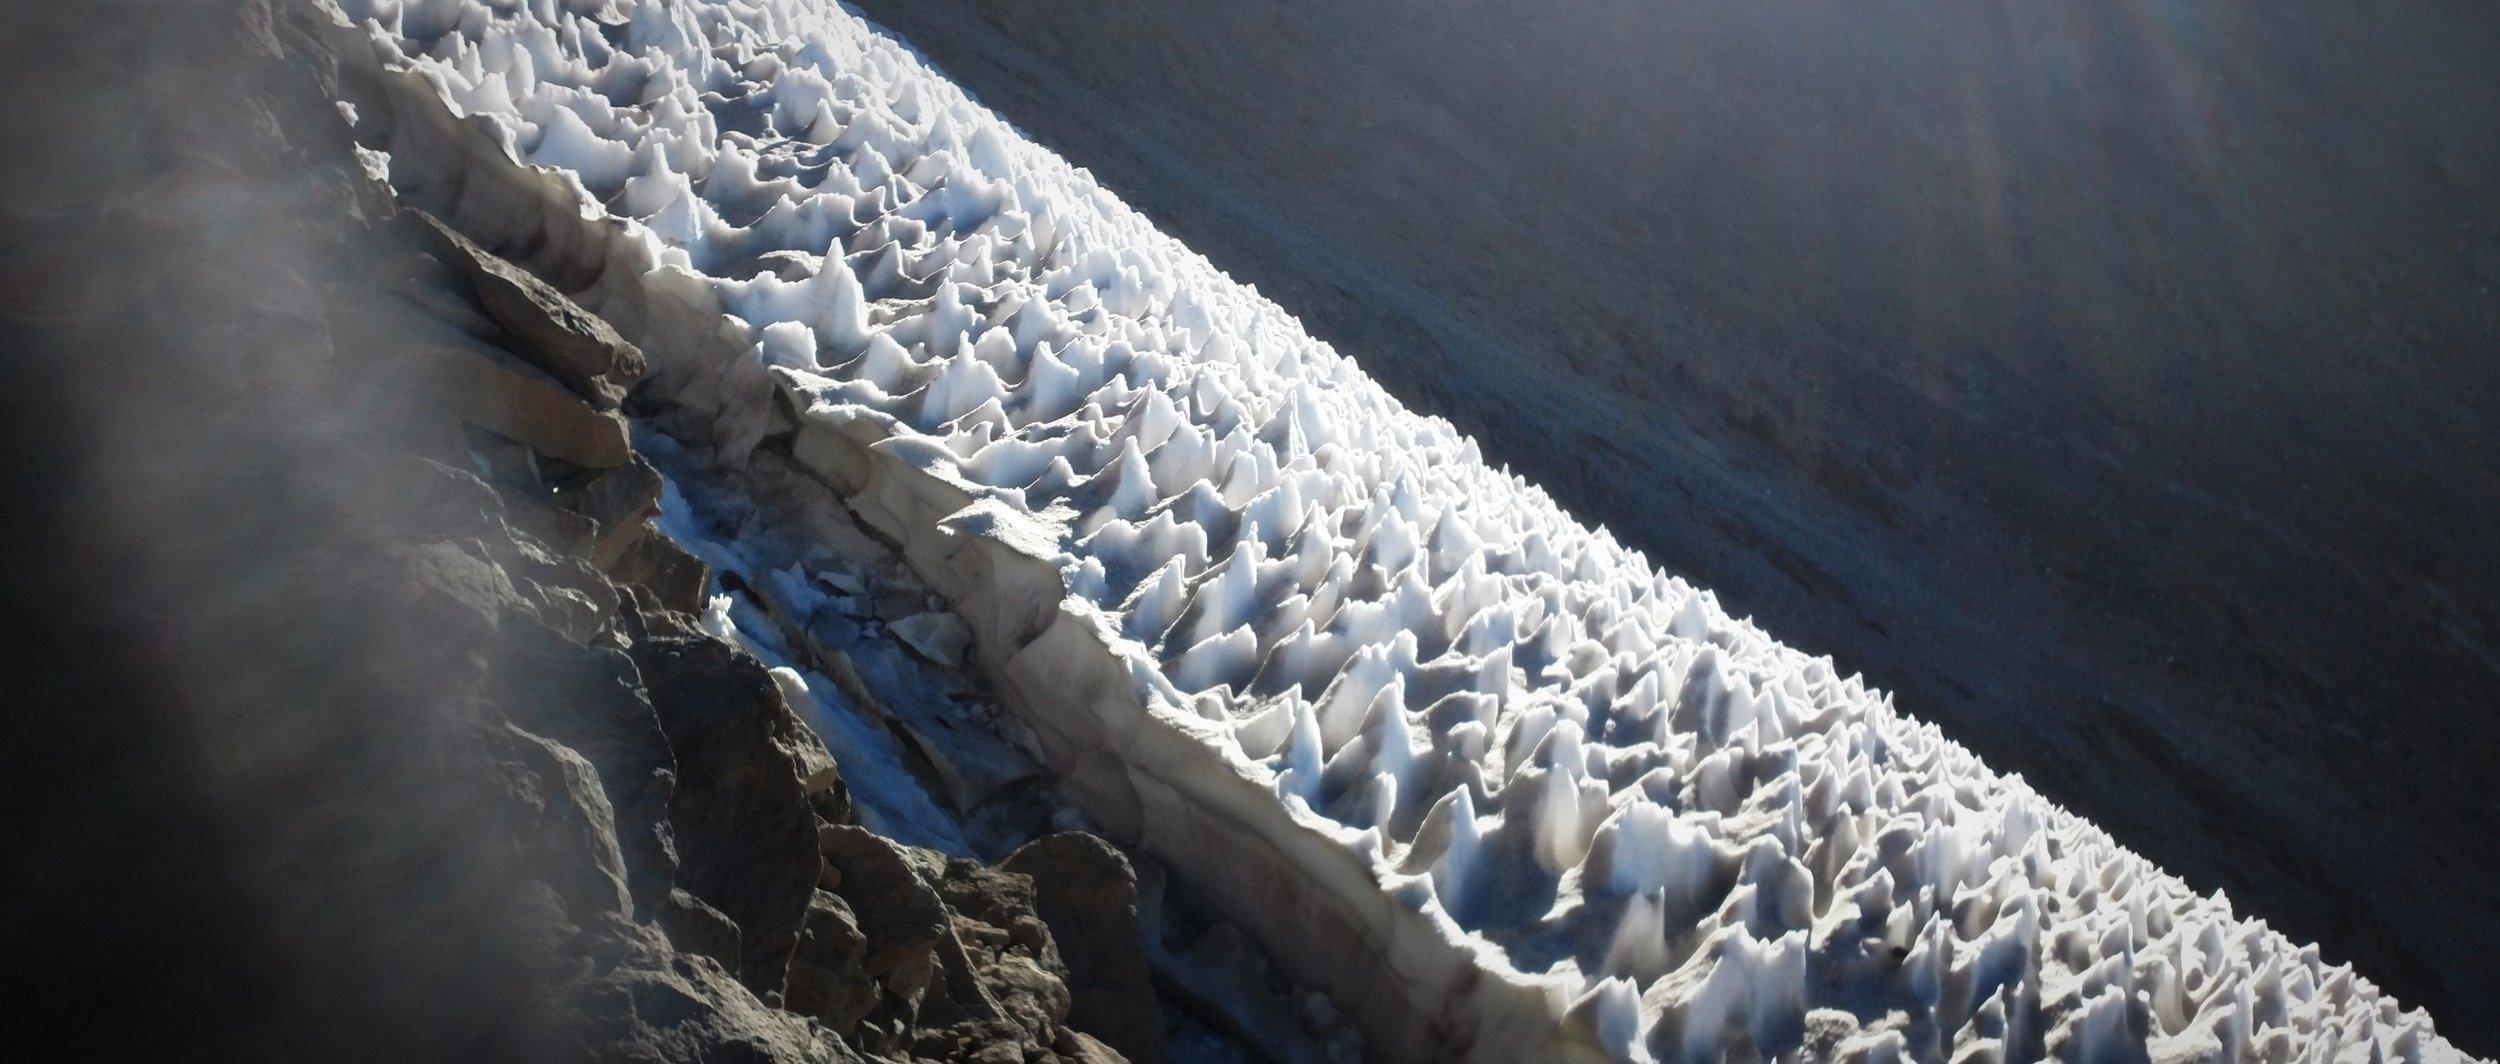 Snow ice-field at 5000m, Mt. Damavand, Iran